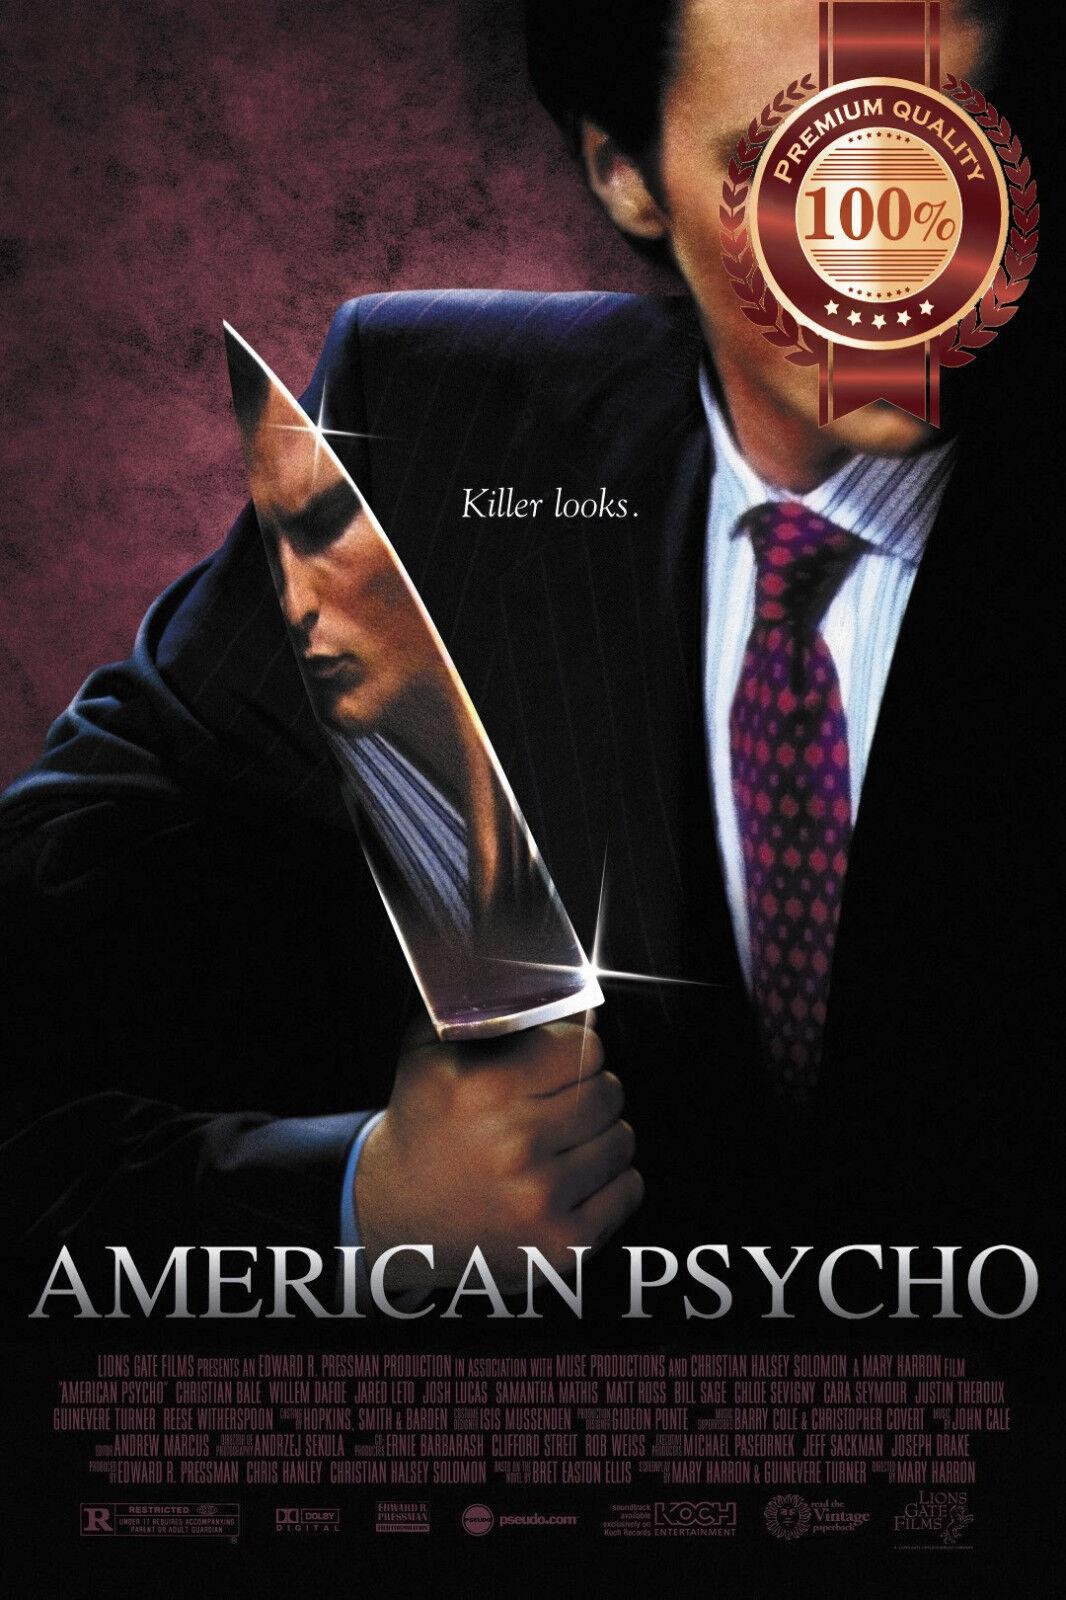 NEW AMERICAN PSYCHO CHRISTIAN BALE MOVIE ORIGINAL CINEMA PRINT PREMIUM POSTER